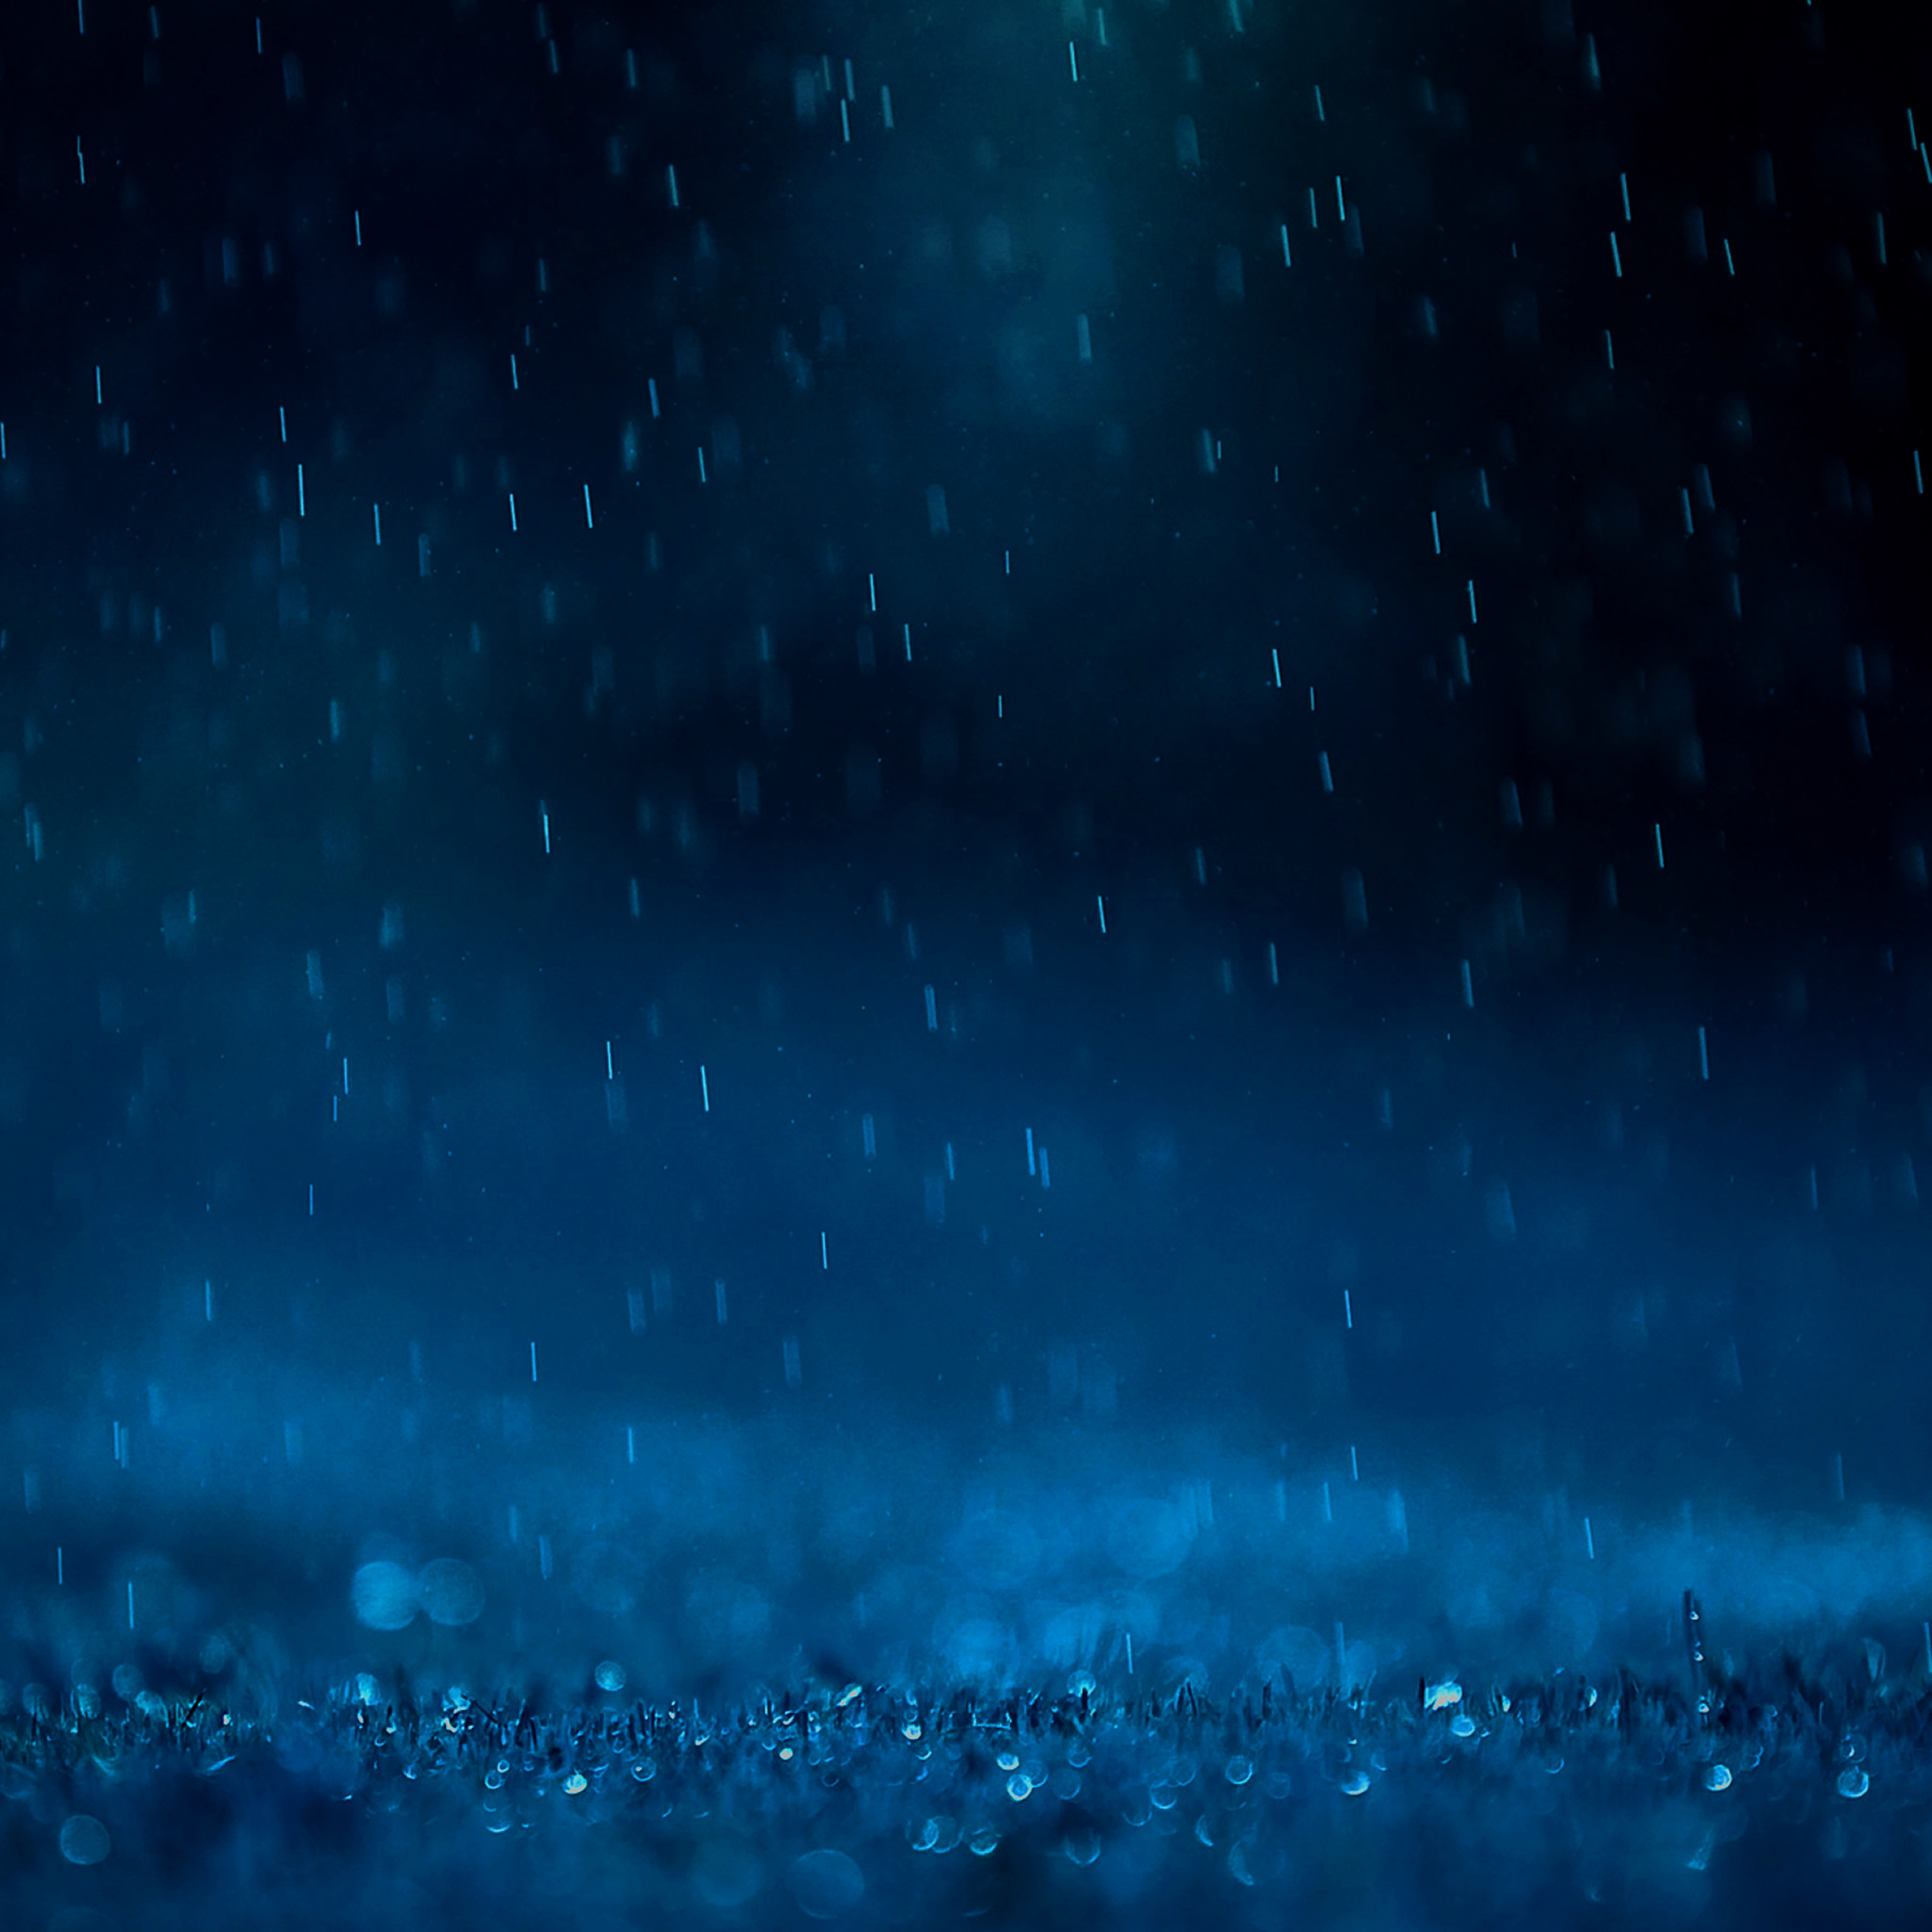 rain wallpaper iphone